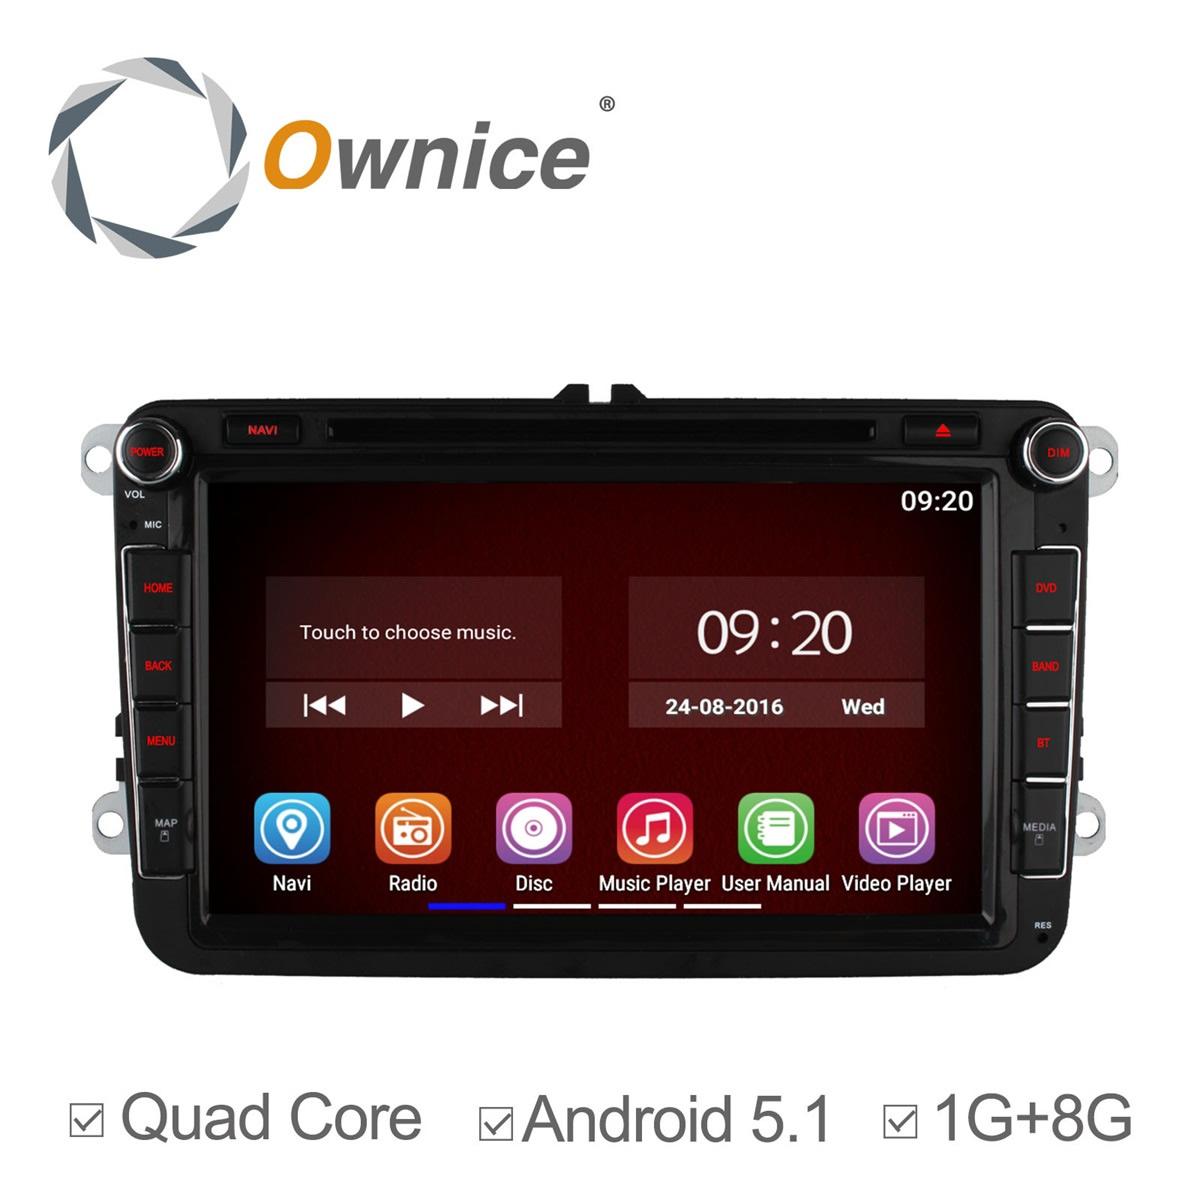 Quad Core Android 5.1 Car DVD Player GPS VW GOLF 5 Golf 6 POLO PASSAT CC JETTA TIGUAN TOURAN EOS SHARAN TRANSPORTER T5 CADDY - Carwin Top D V r store